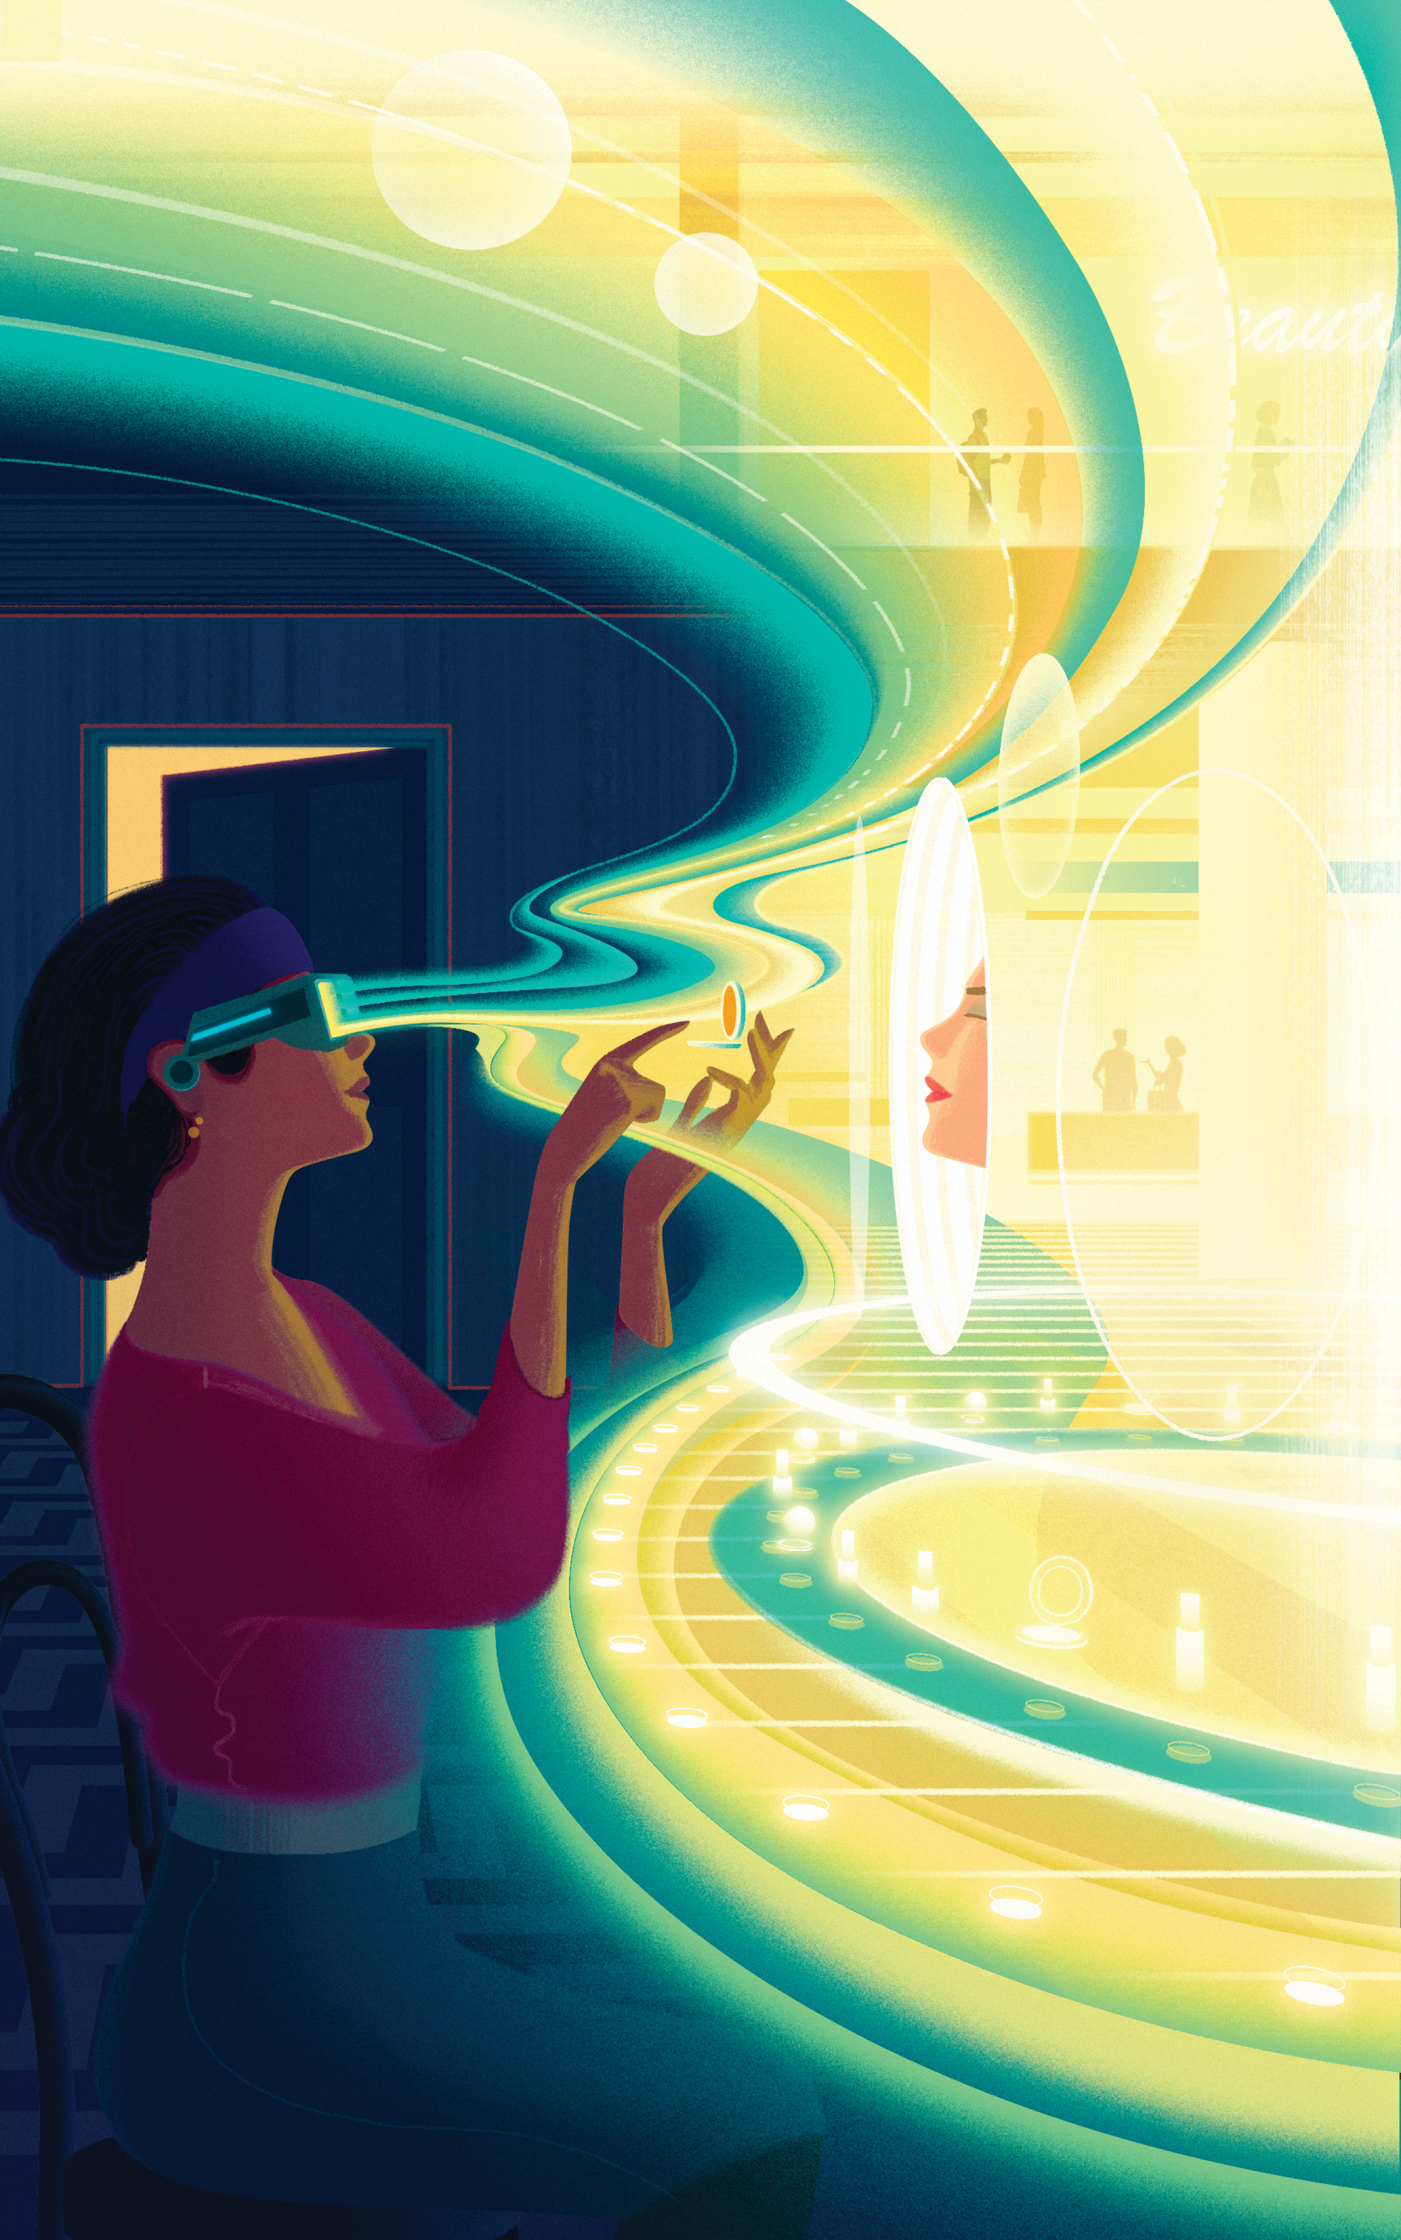 Beauty-inc-virtual-reality-marketplace.jpg